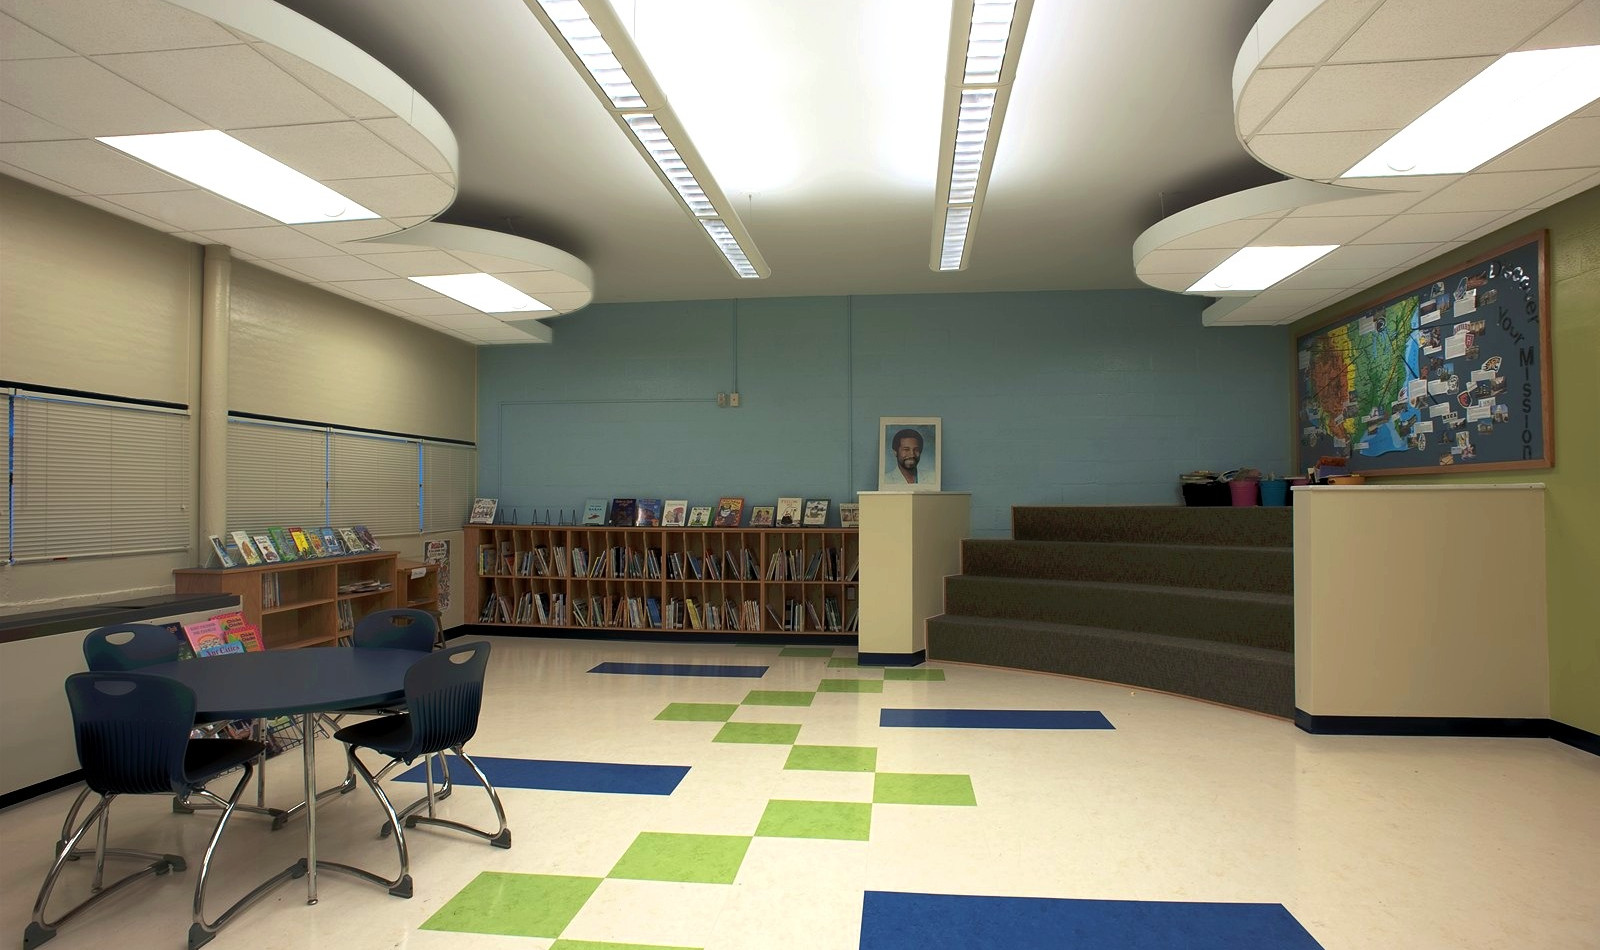 Holabird Academy - Media Center Renovation